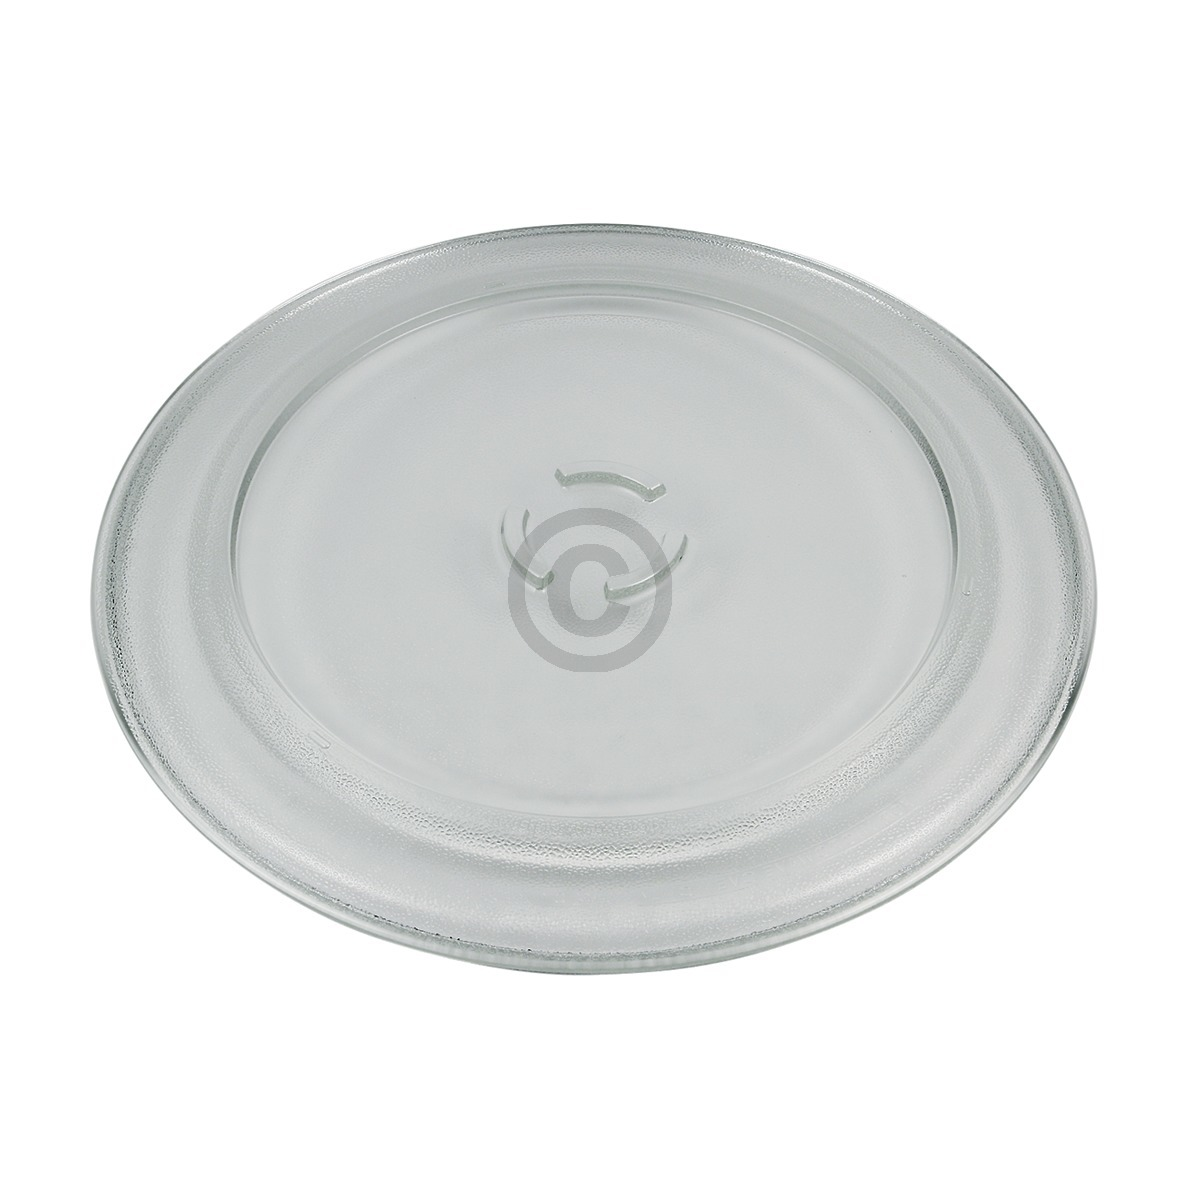 Drehteller Glasteller 360mmØ 481946678348 Bauknecht, Whirlpool, Ikea, Indesit Ho